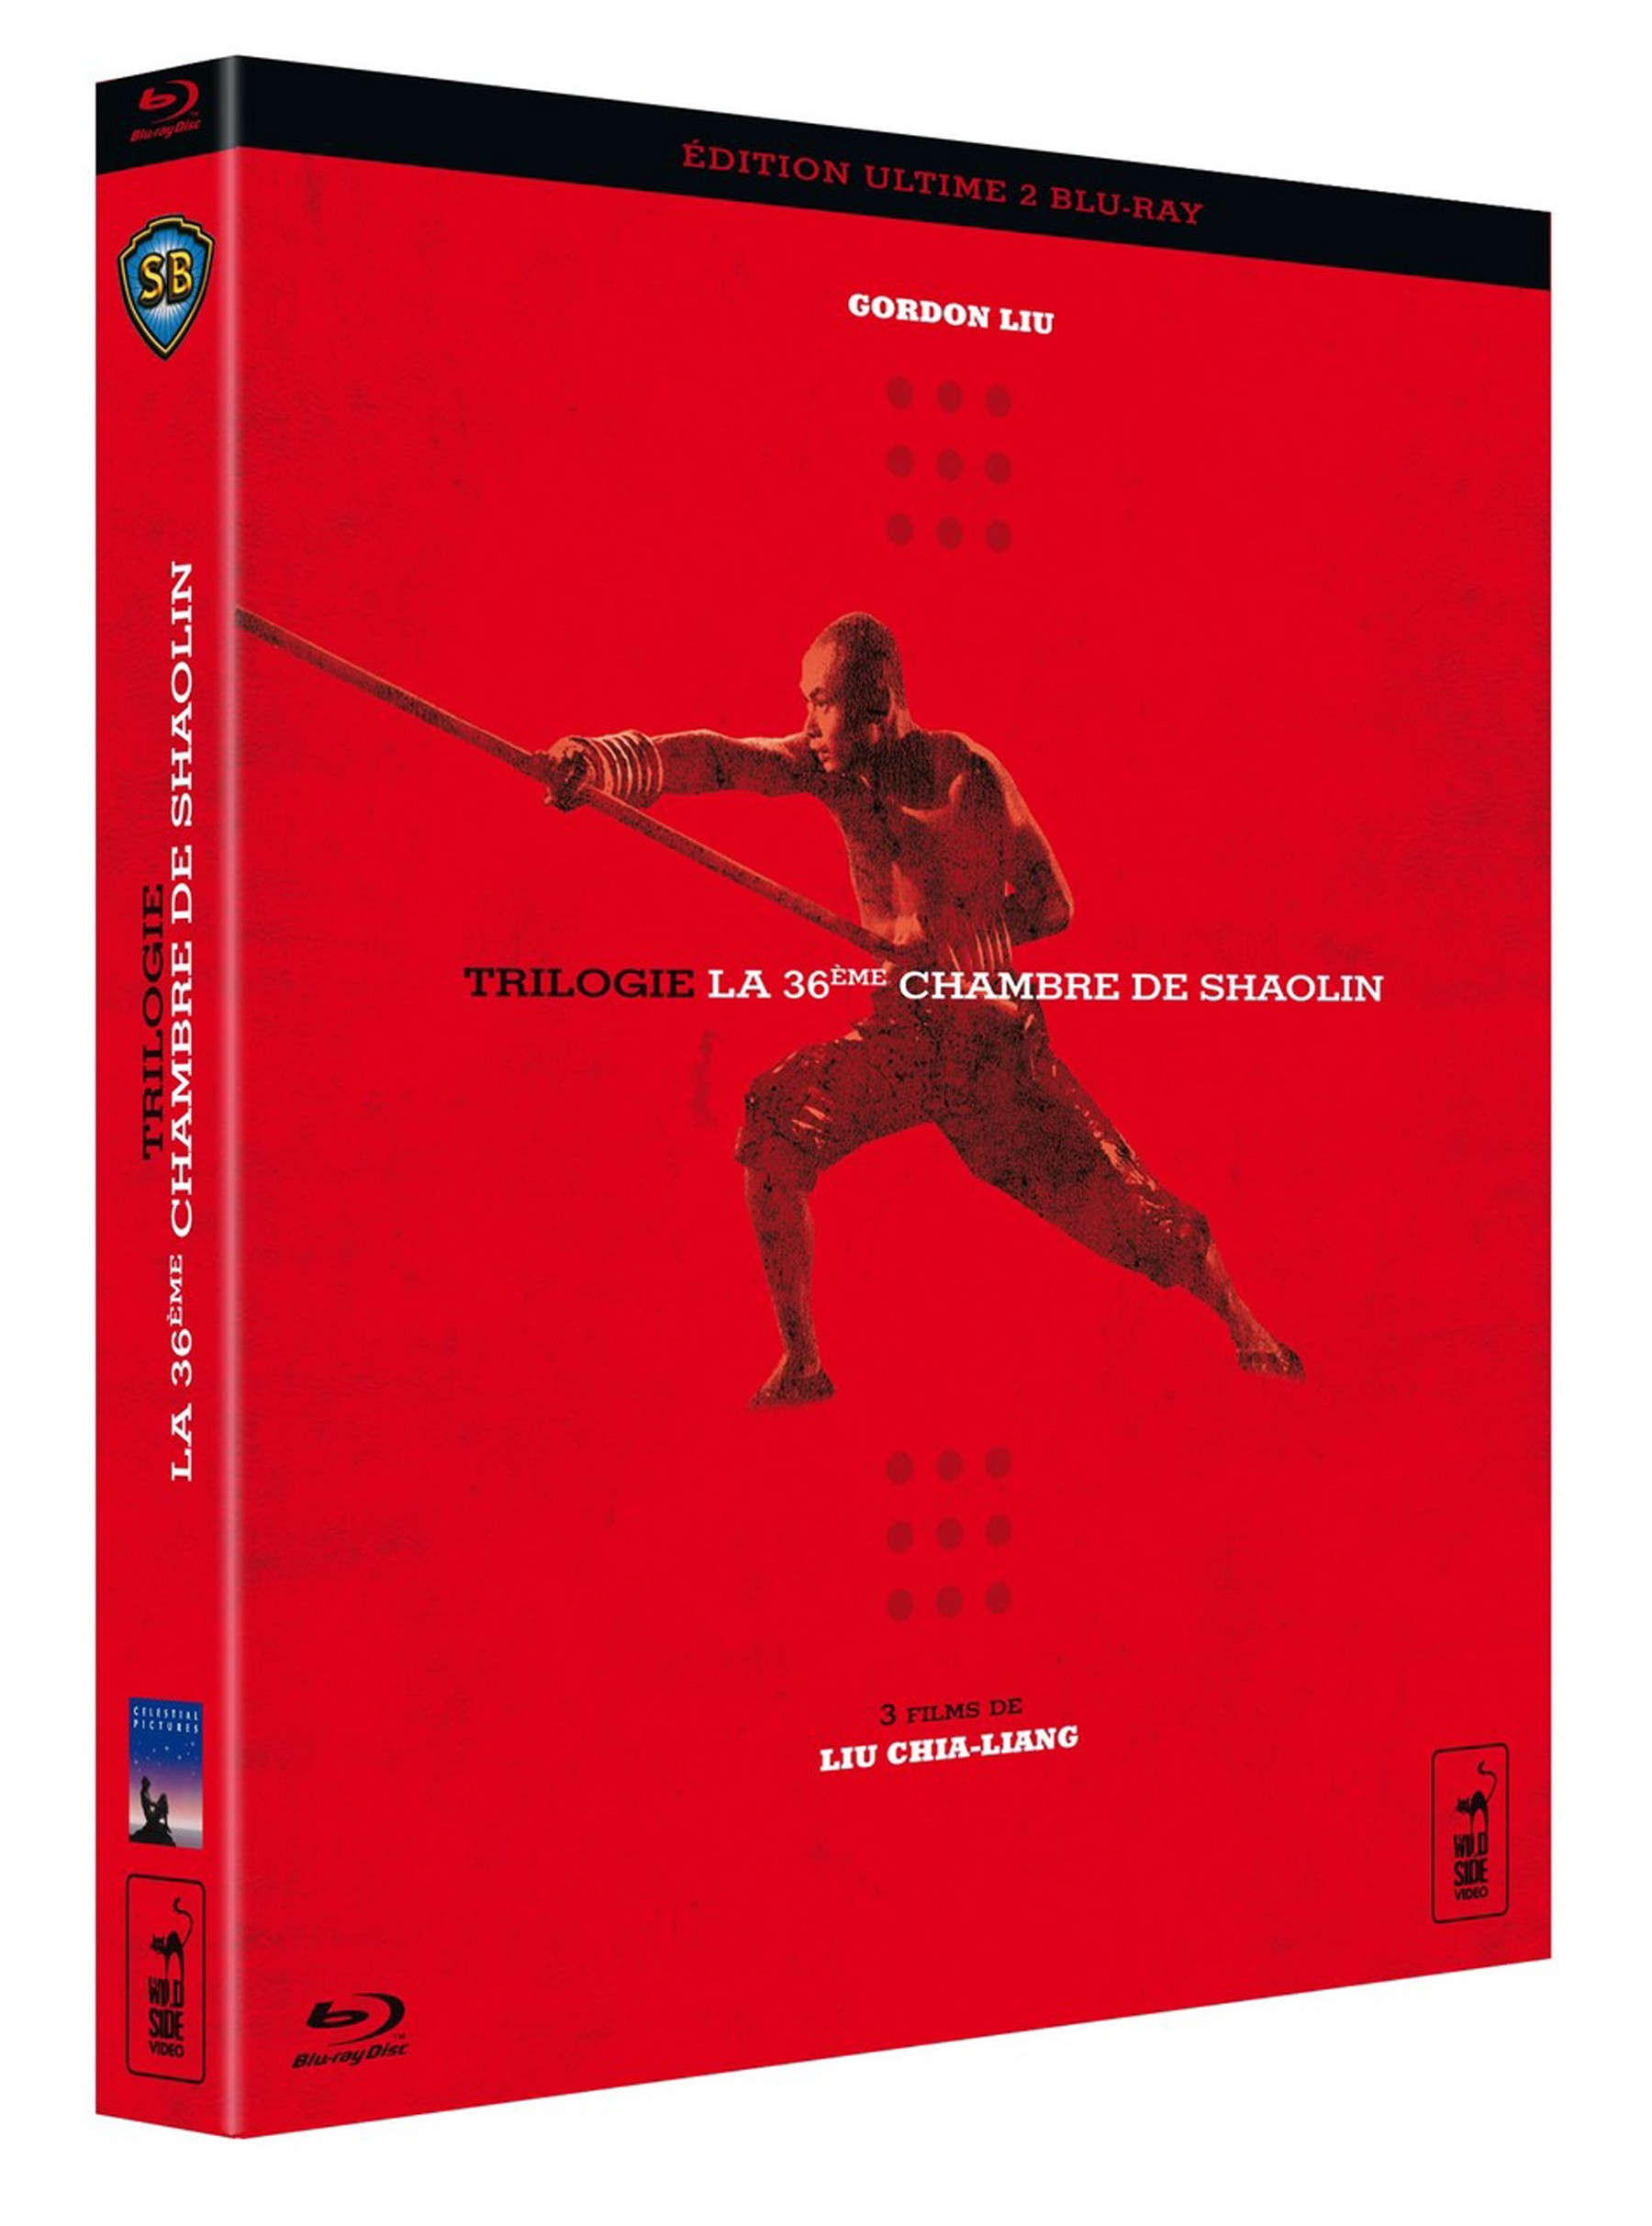 Les disciples de la 36e chambre en dvd blu ray for 36e chambre de shaolin